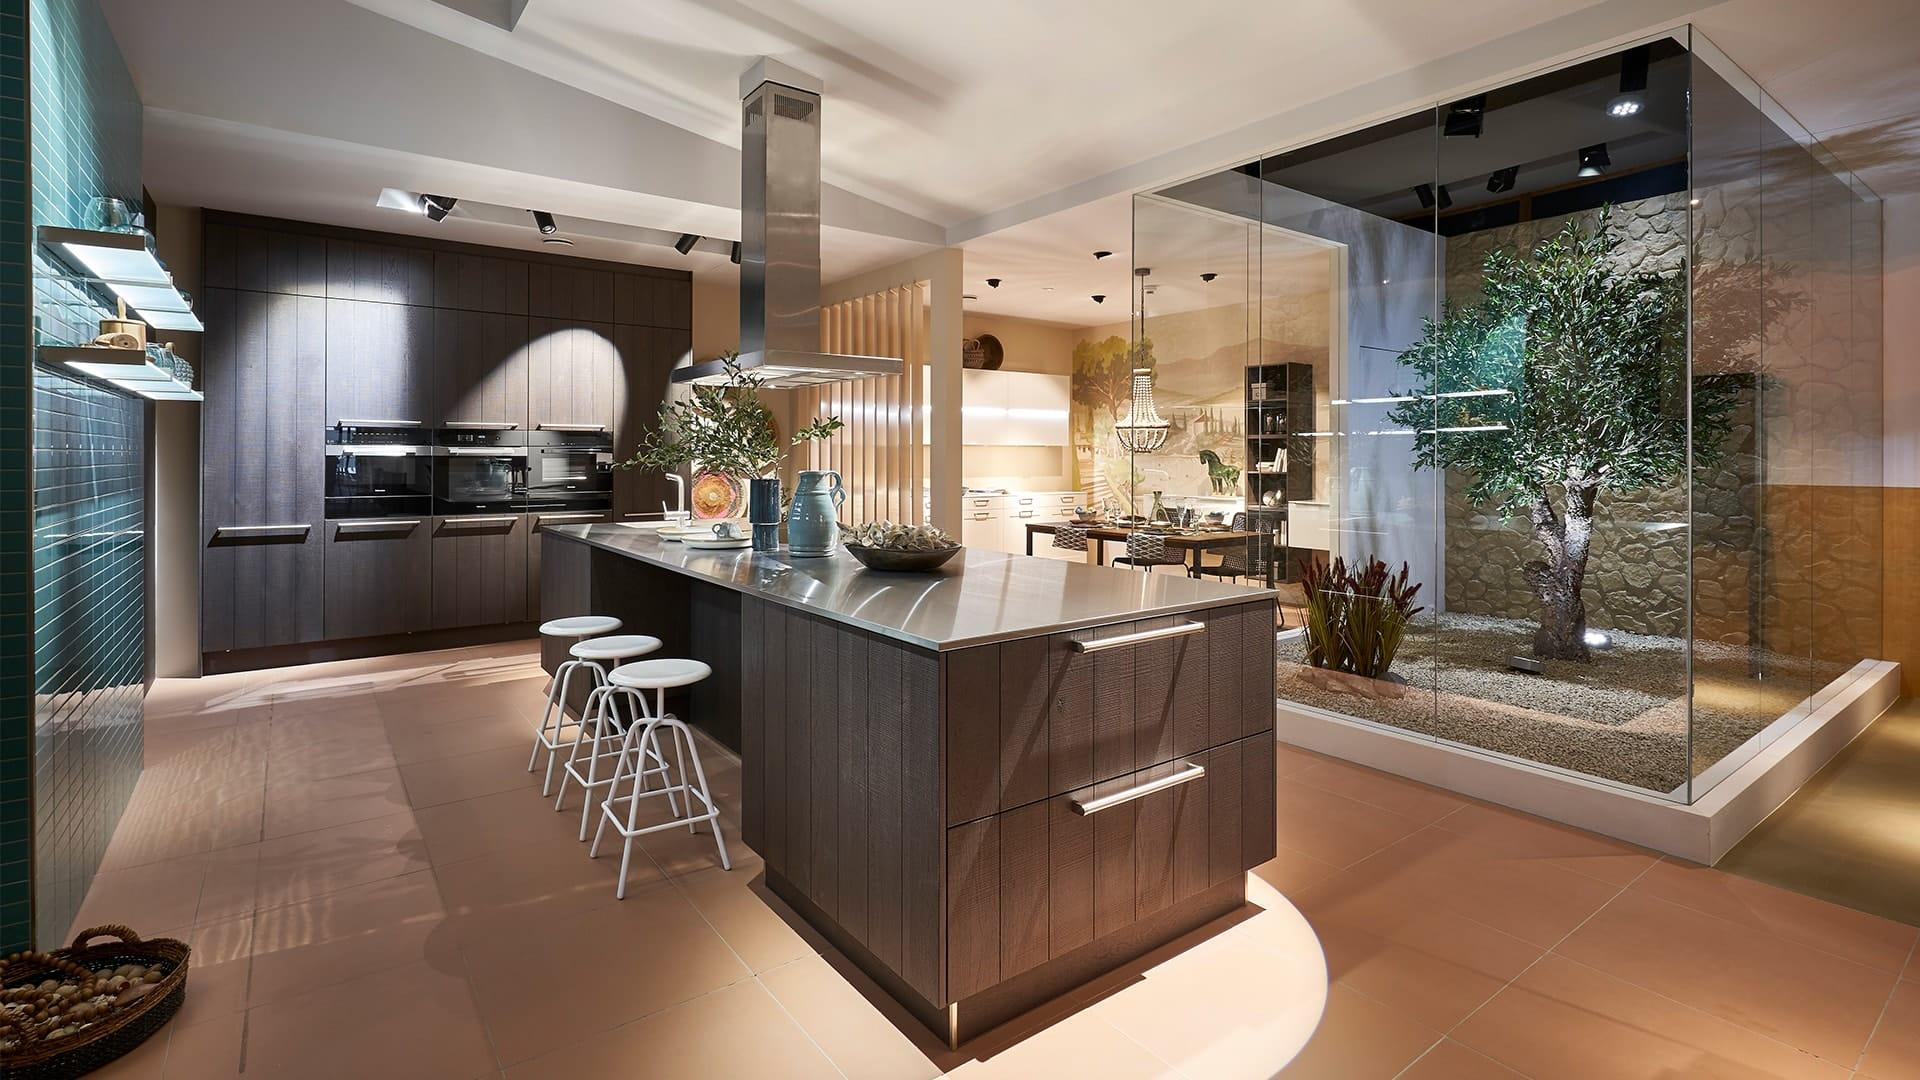 Exclusieve Keukens Keukencentrum Uniek In Hoogeveen